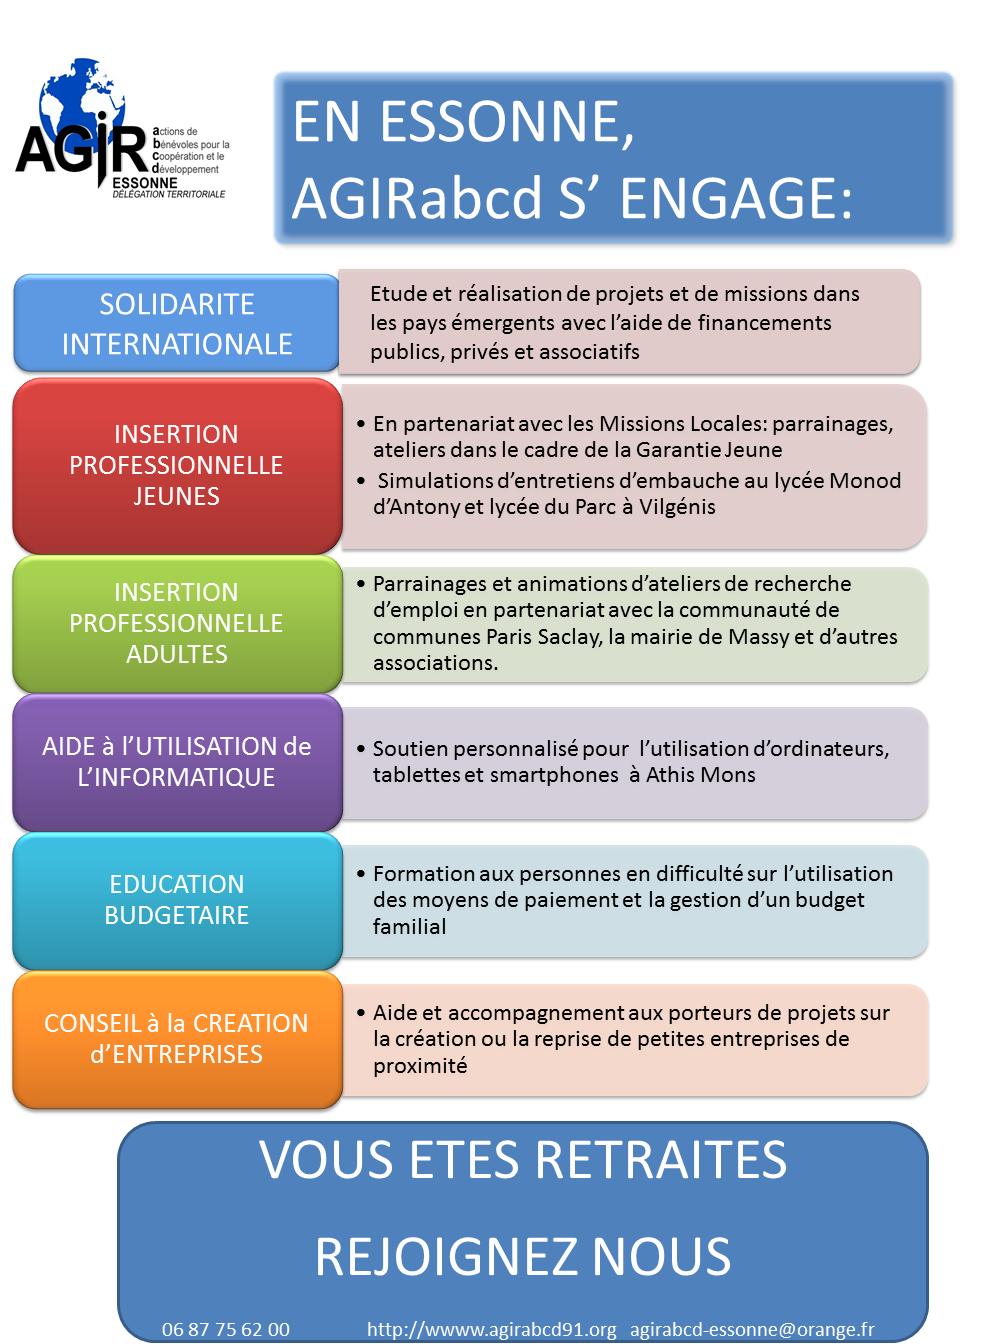 En Essonne, AGIRabcd s'engage :